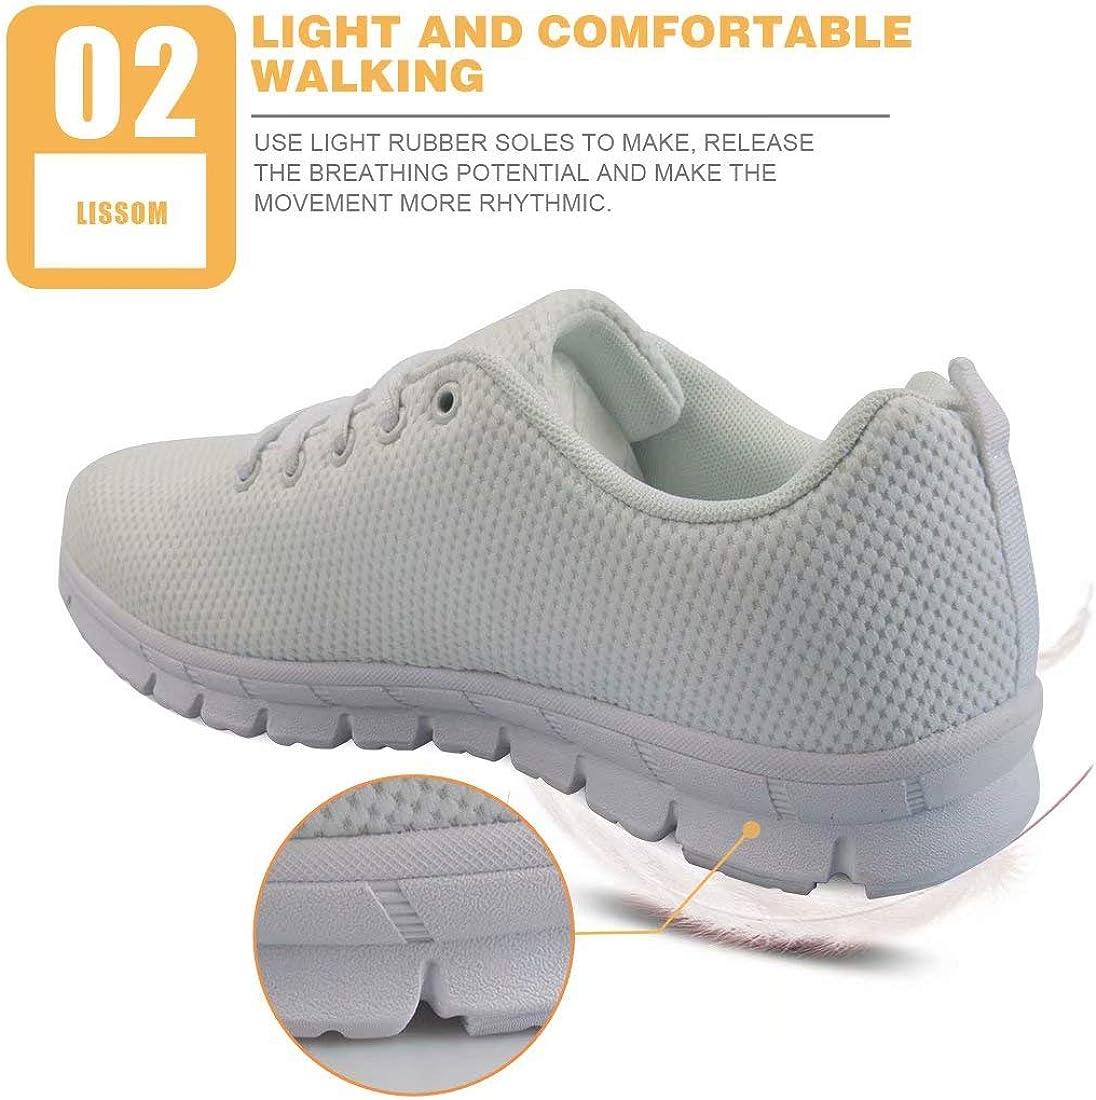 Chaqlin Baskets Mode Chaussures De Sport Femme Running Léger Respirantes Course Sneakers Multisports Outdoor Casual Des A 2 Nurse Bear